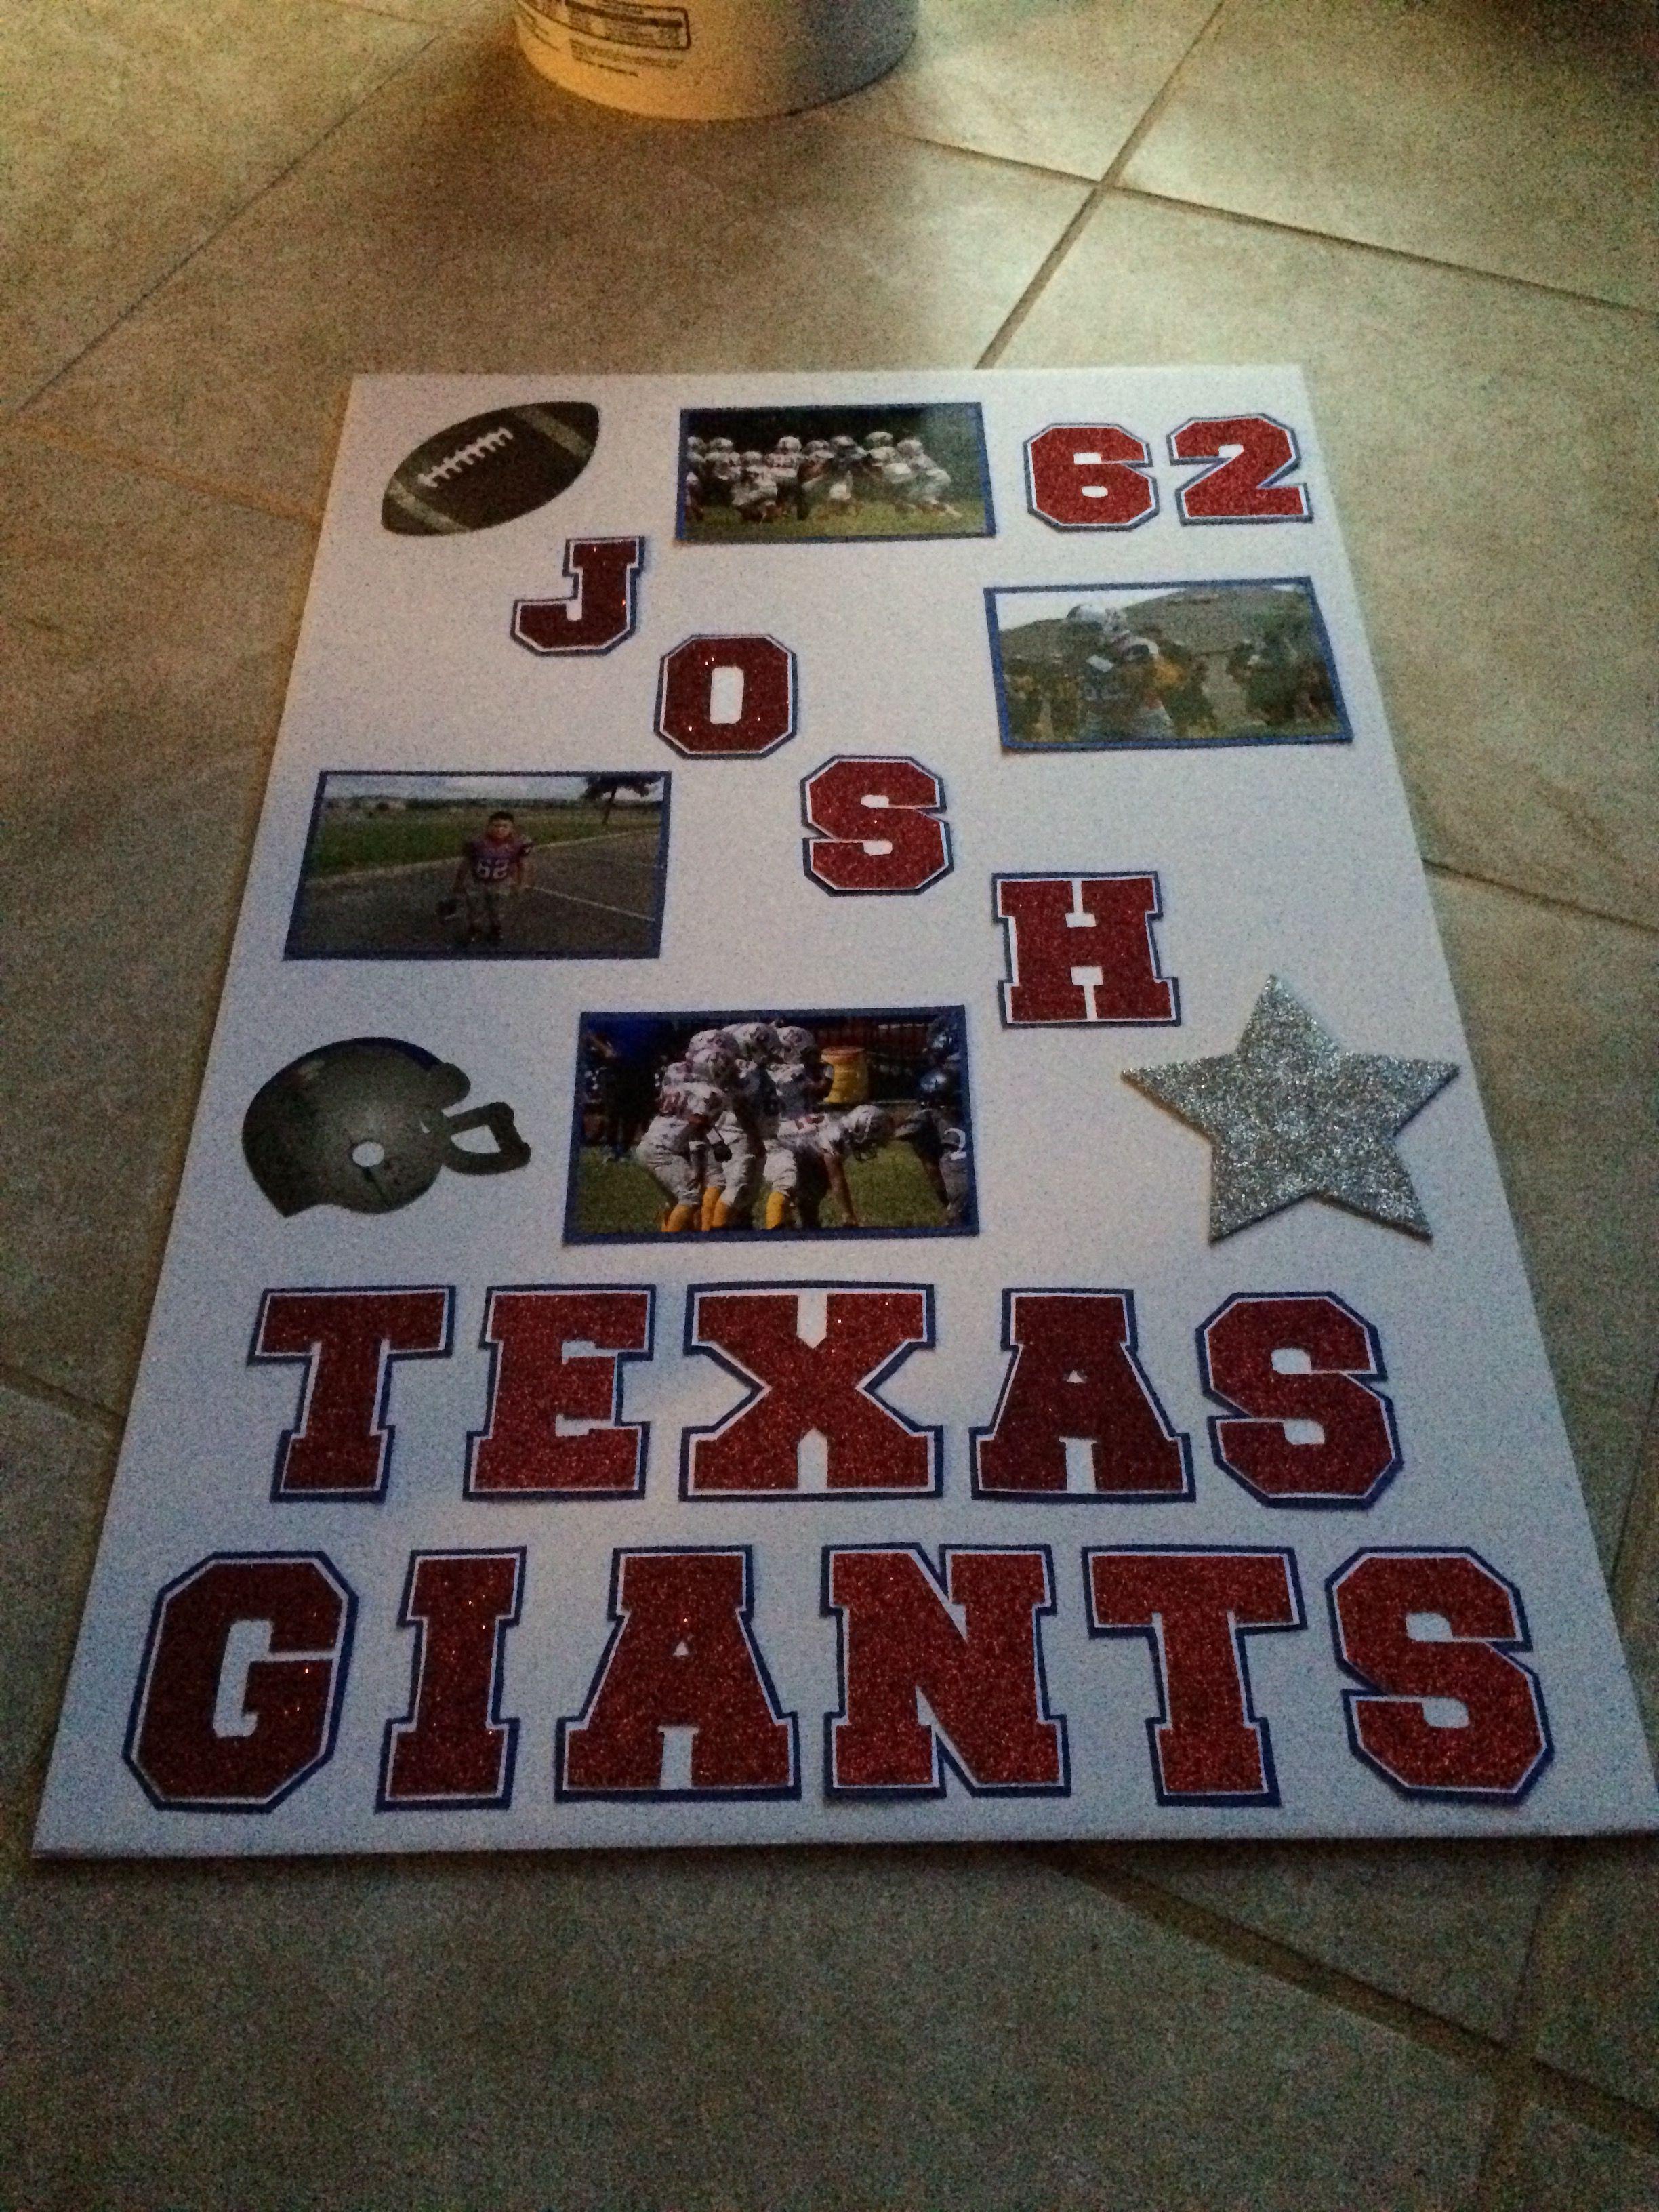 Homecoming Poster Peewee Football Little Giants Texas Giants Homecoming Posters Homecoming Poster Ideas Senior Night Gifts Football